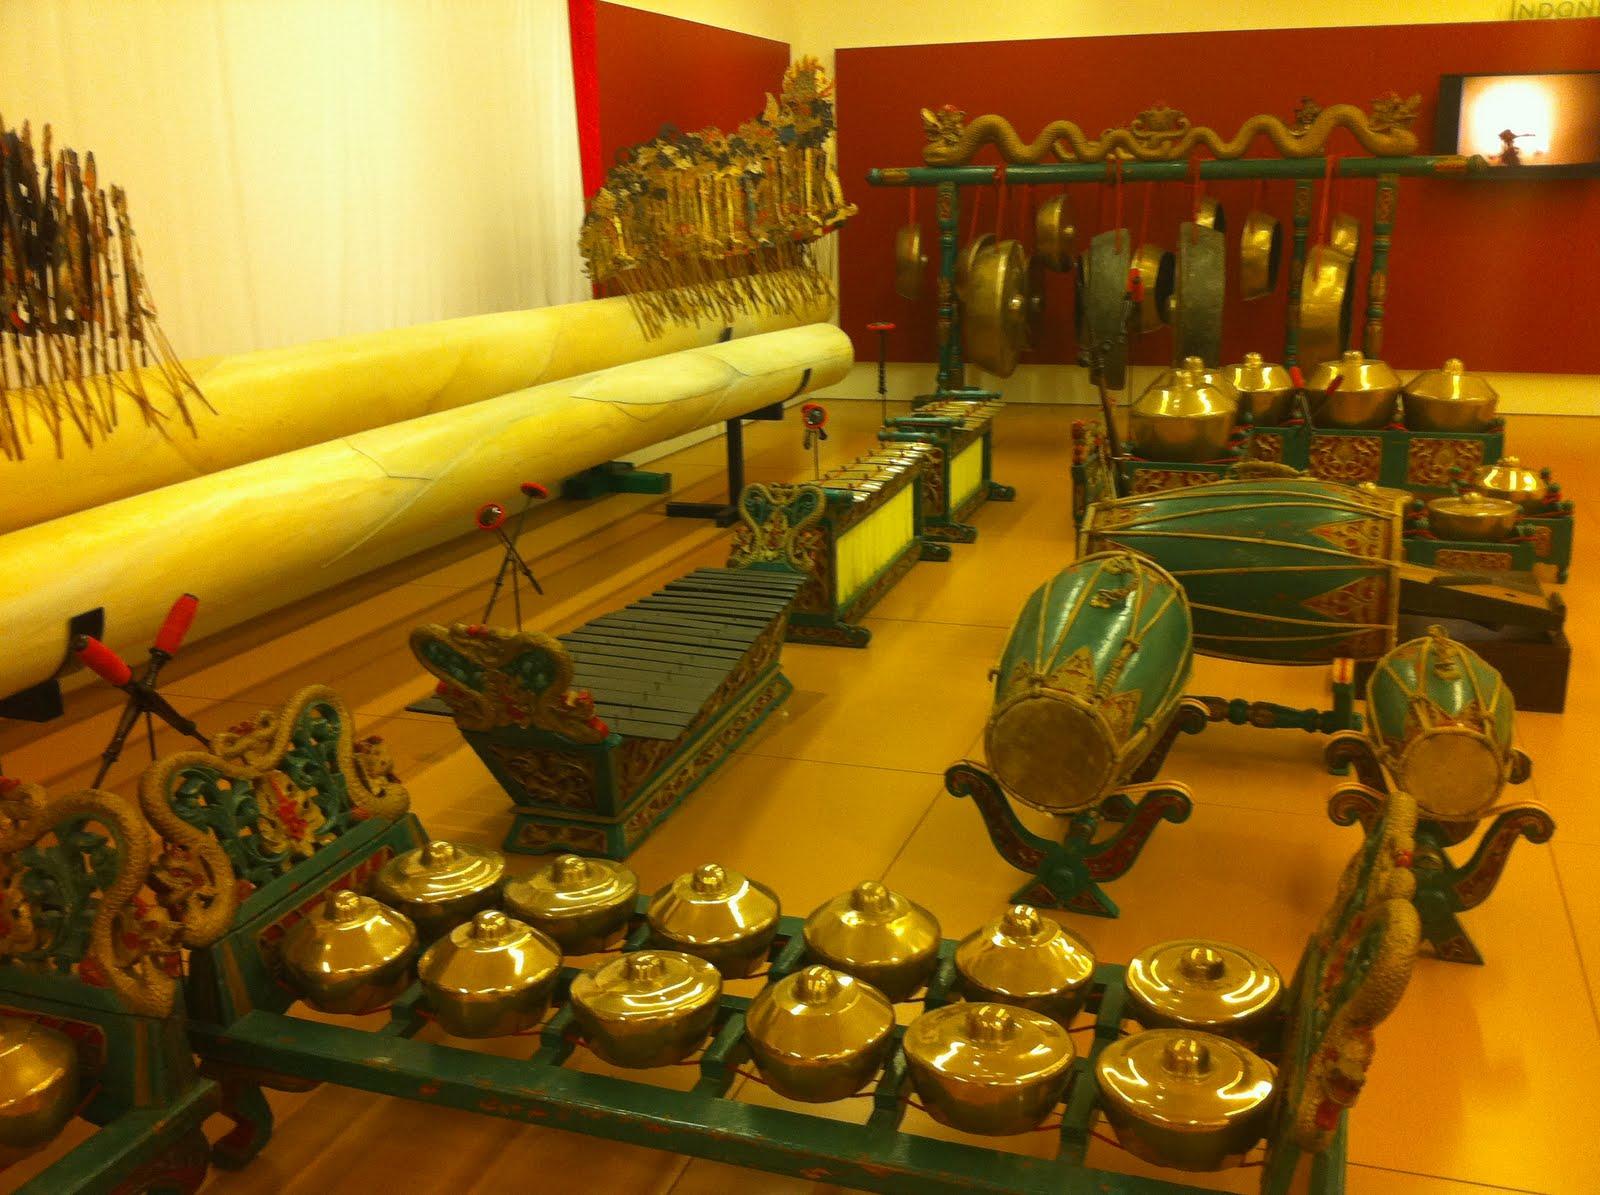 ... , Brussels, Belgium, Musical Instrument Museum, China instruments